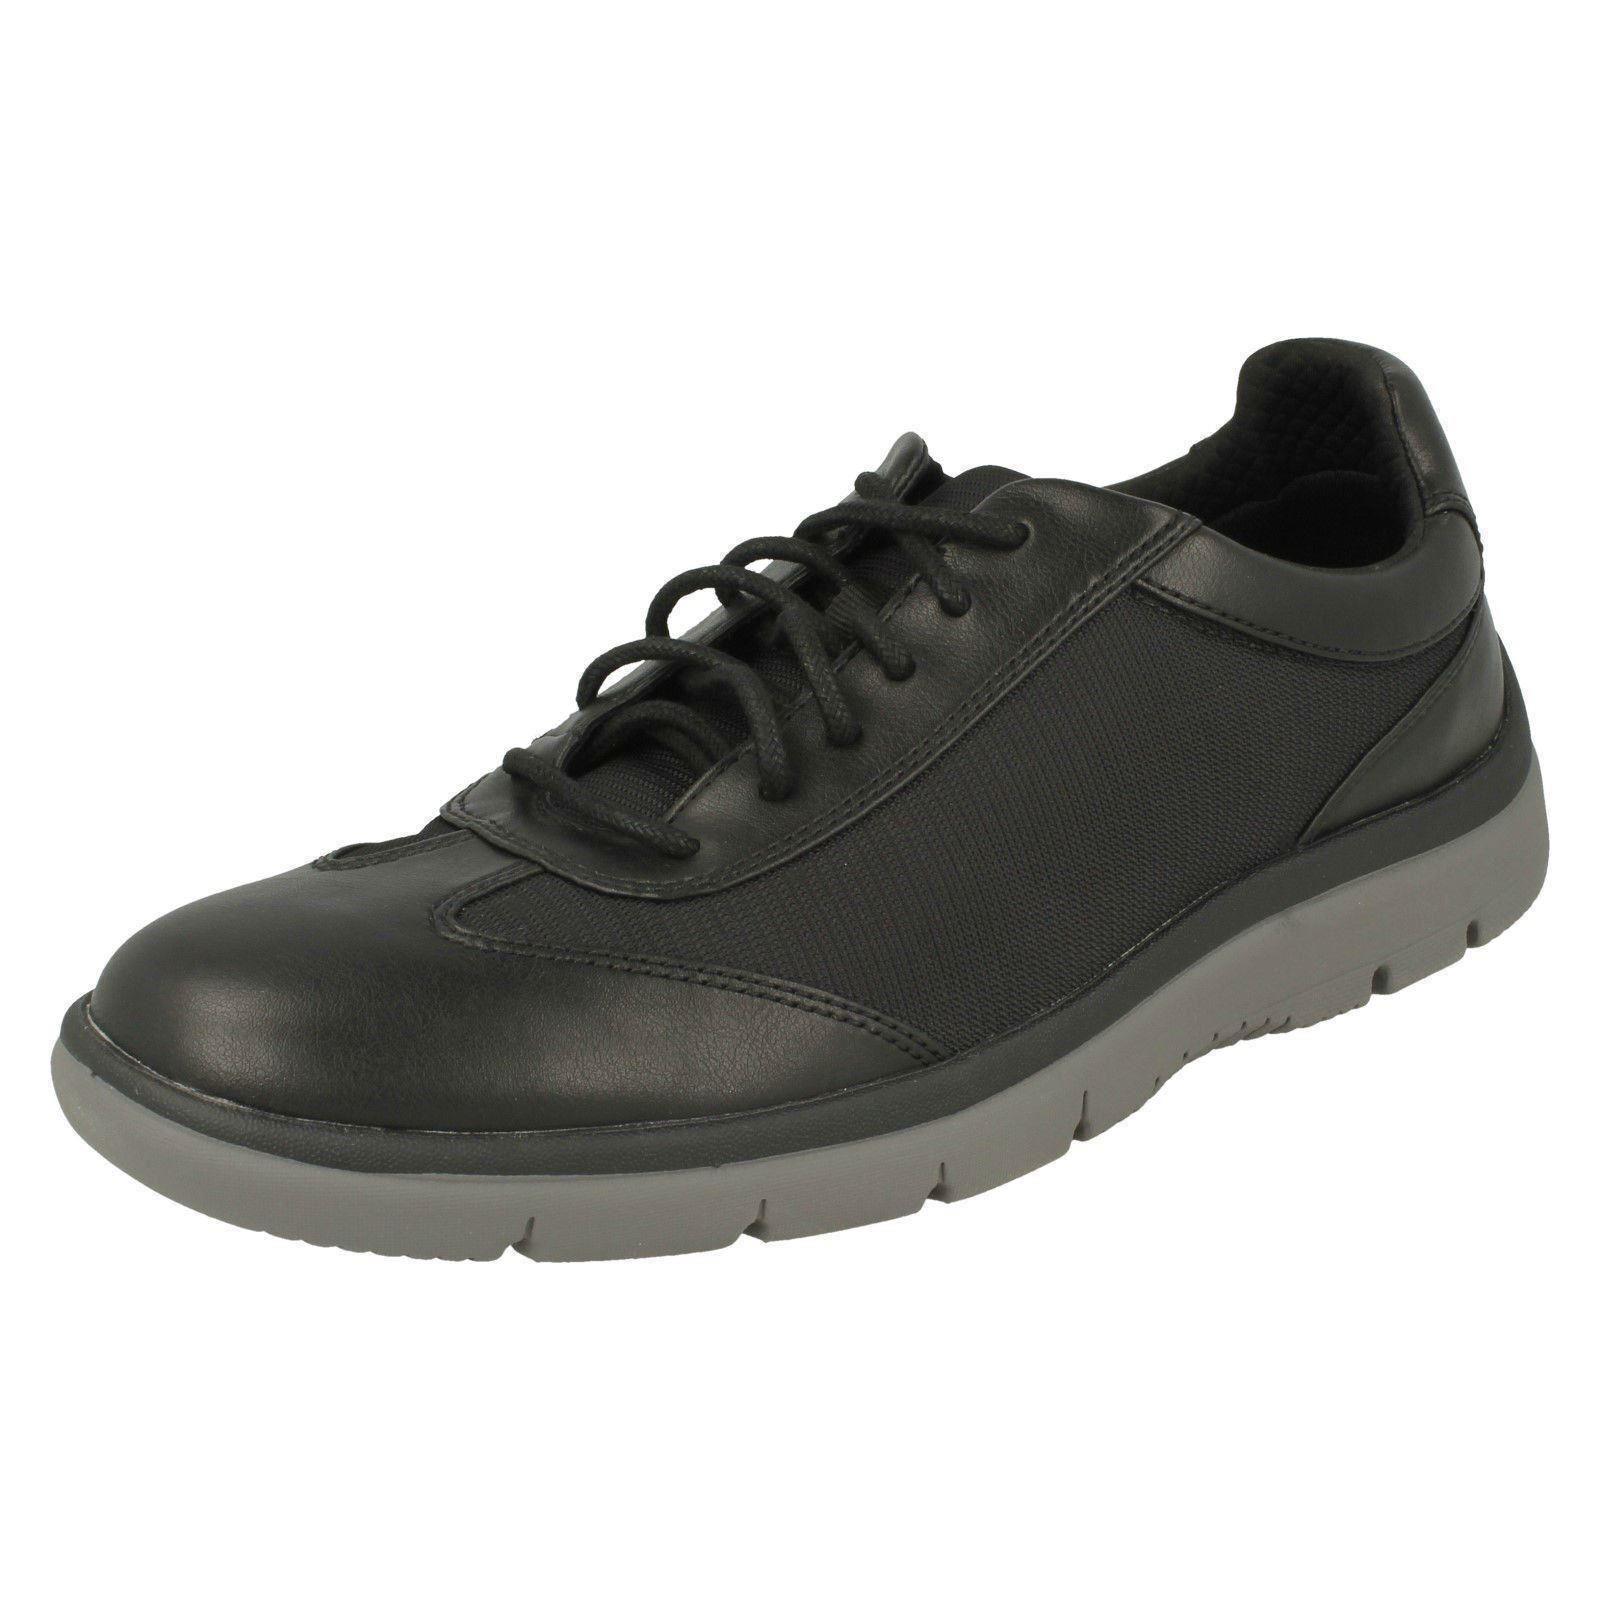 Hombre Clarks Cloudsteppers Tunsil Ridge Zapatos Casual con Cordones Cordones Cordones Ajuste G 63eae5